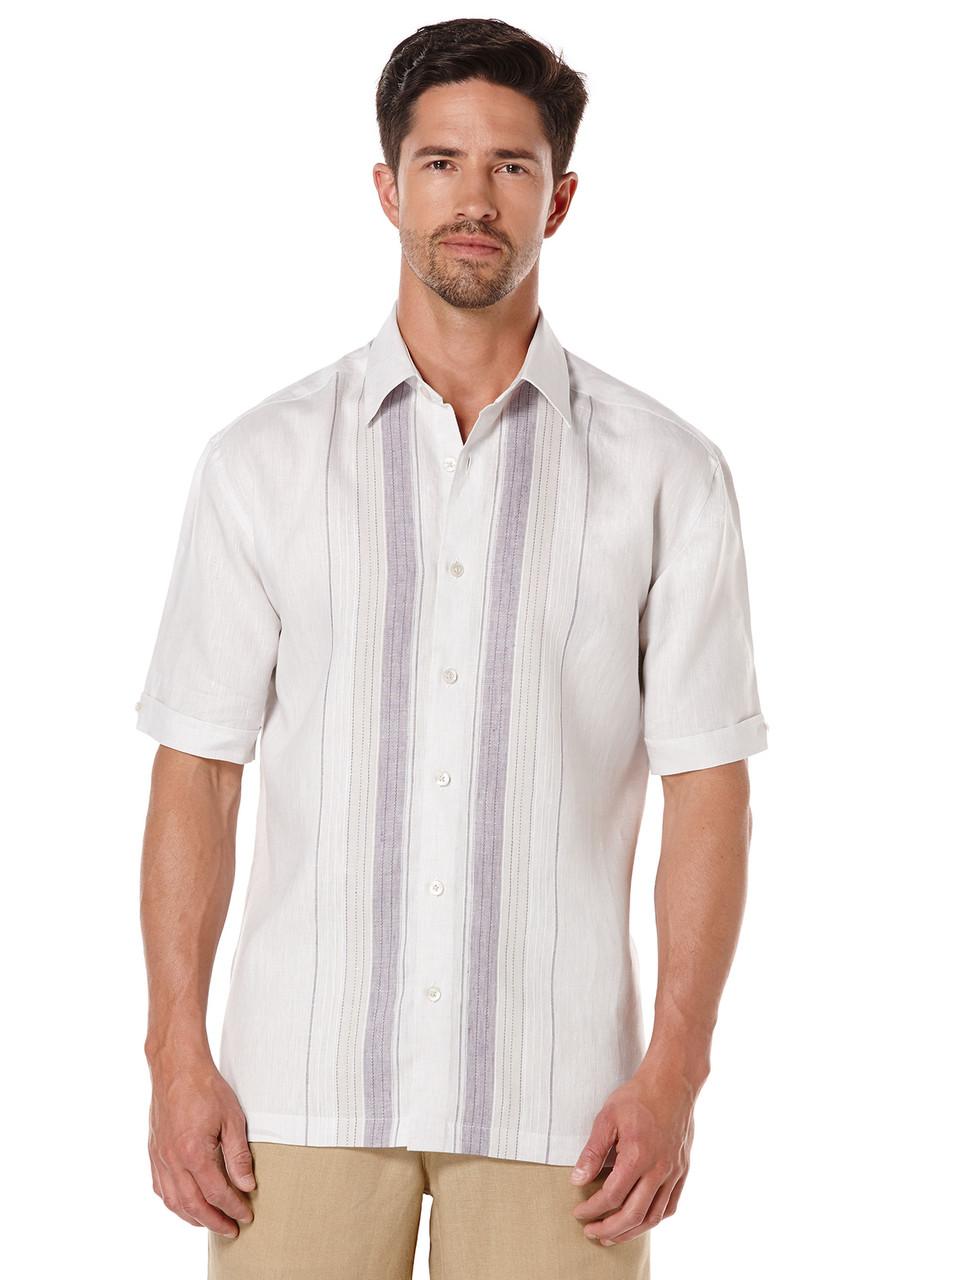 Рубашка Cubavera, L, Bright White, CUWH5015DS